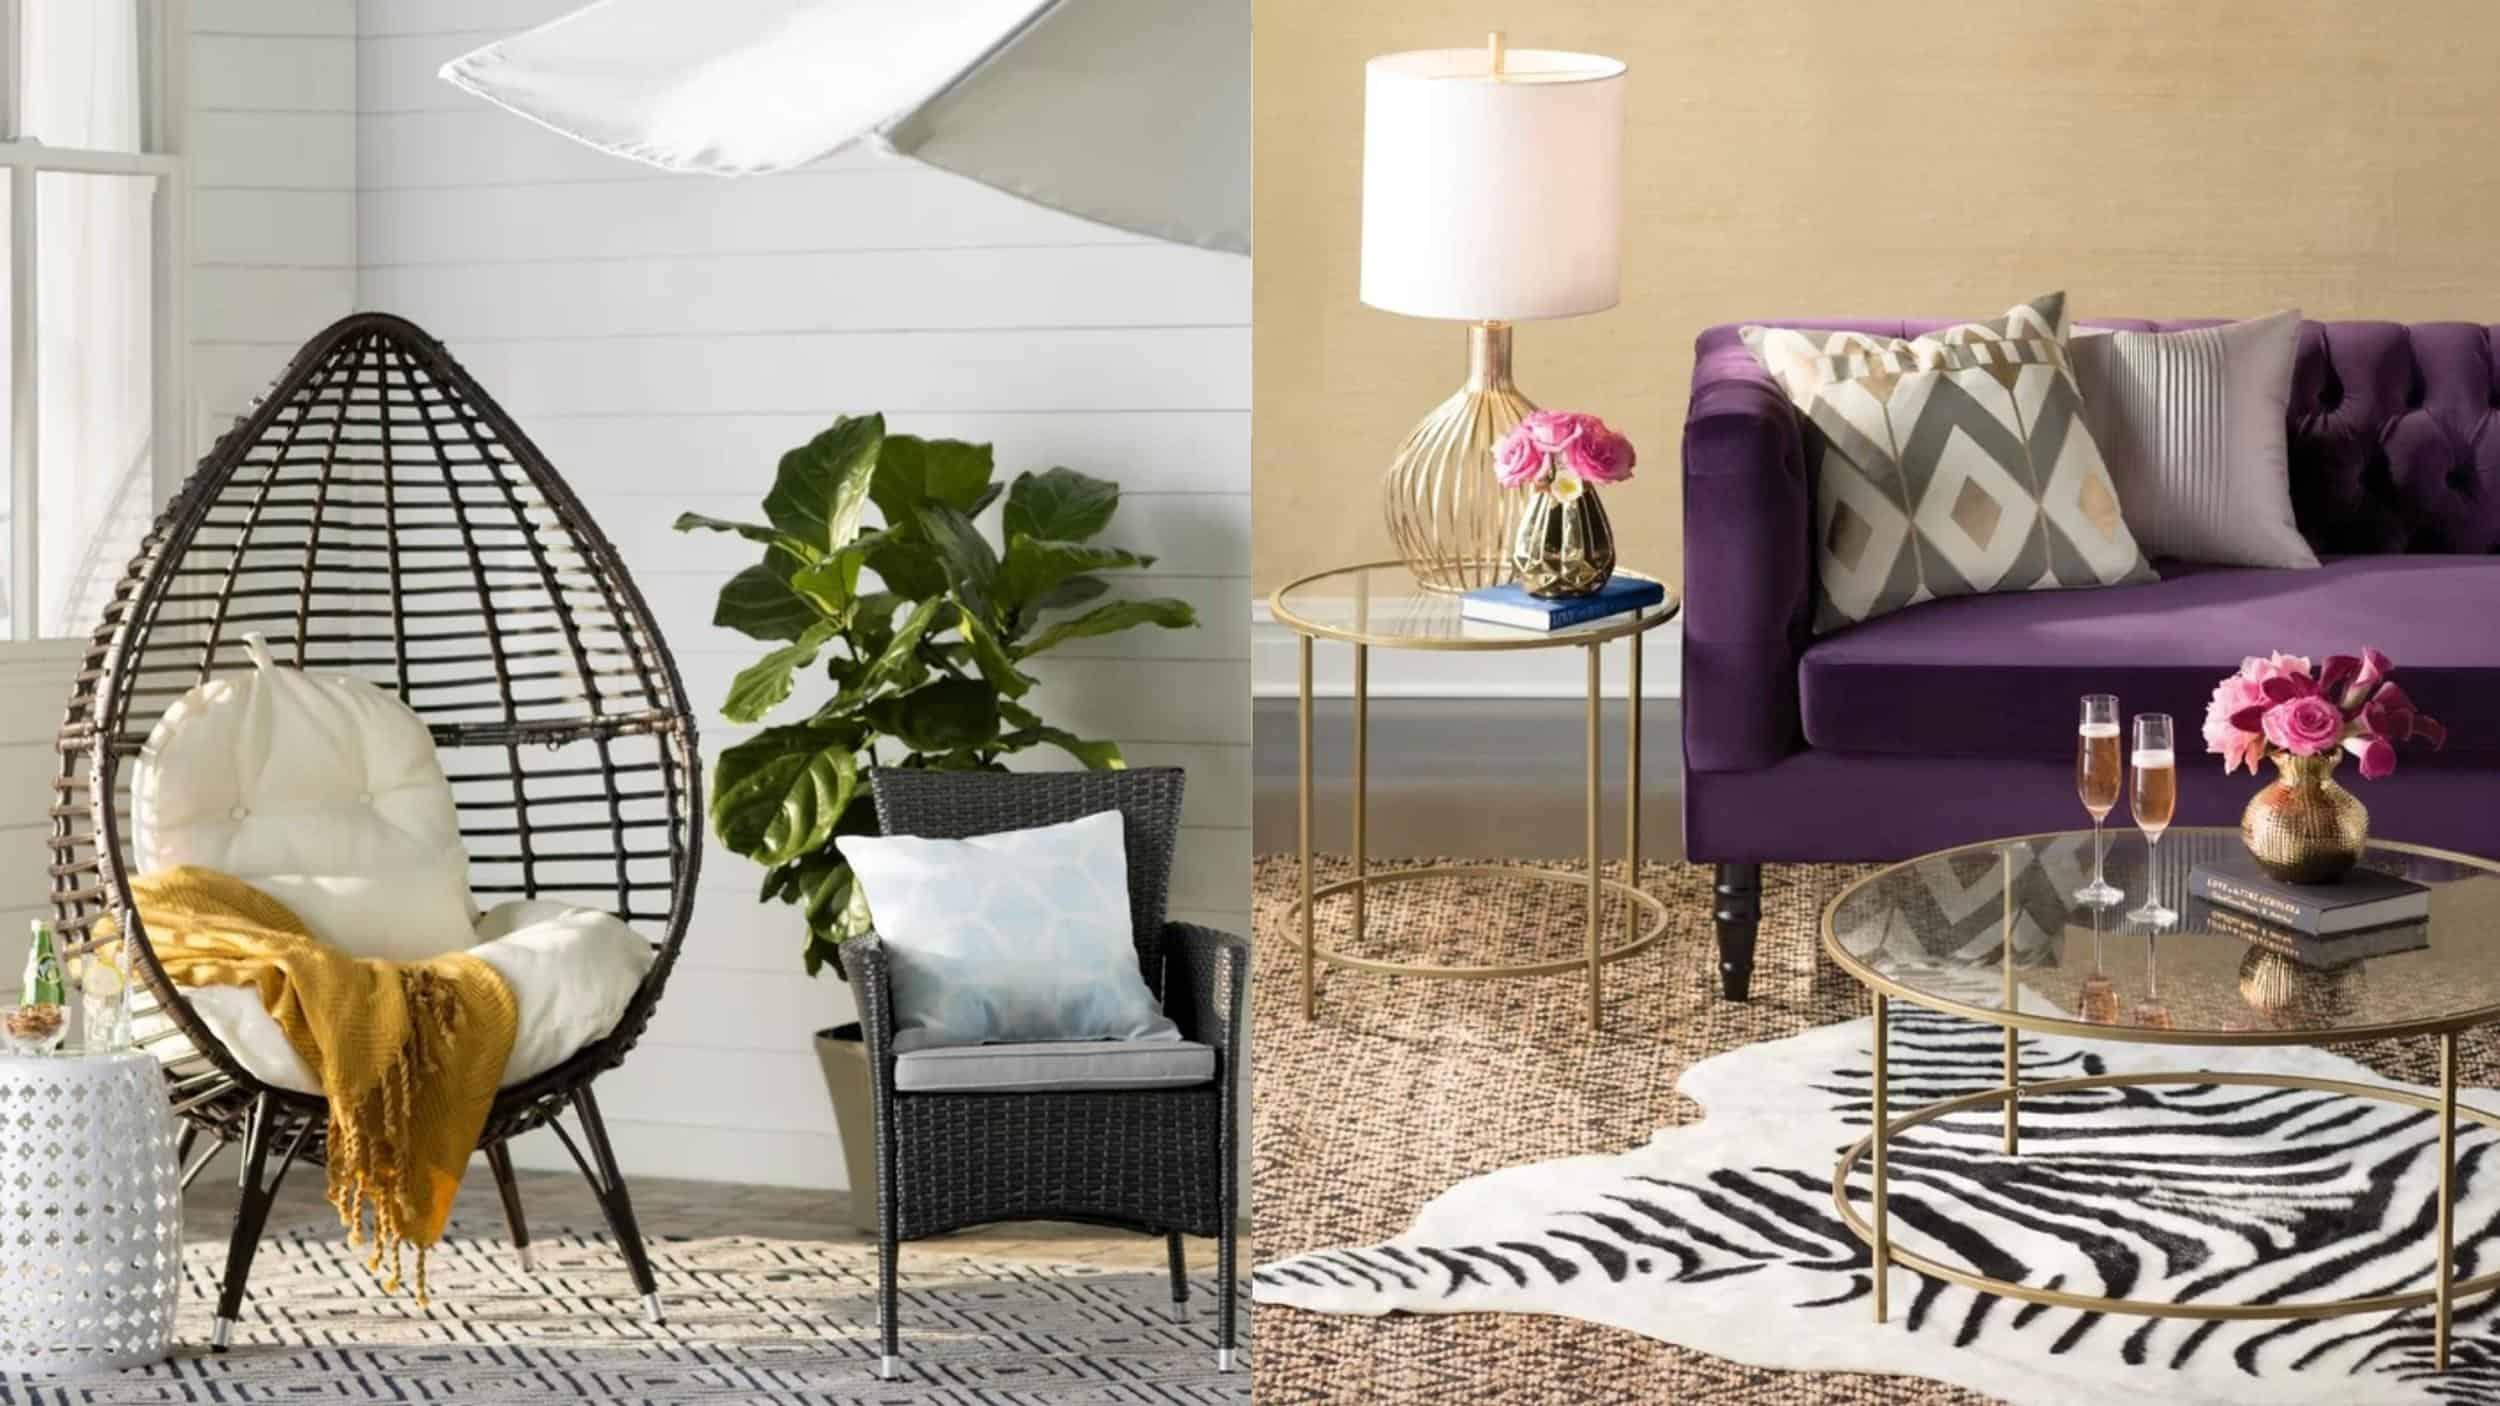 Is Wayfair Furniture Good